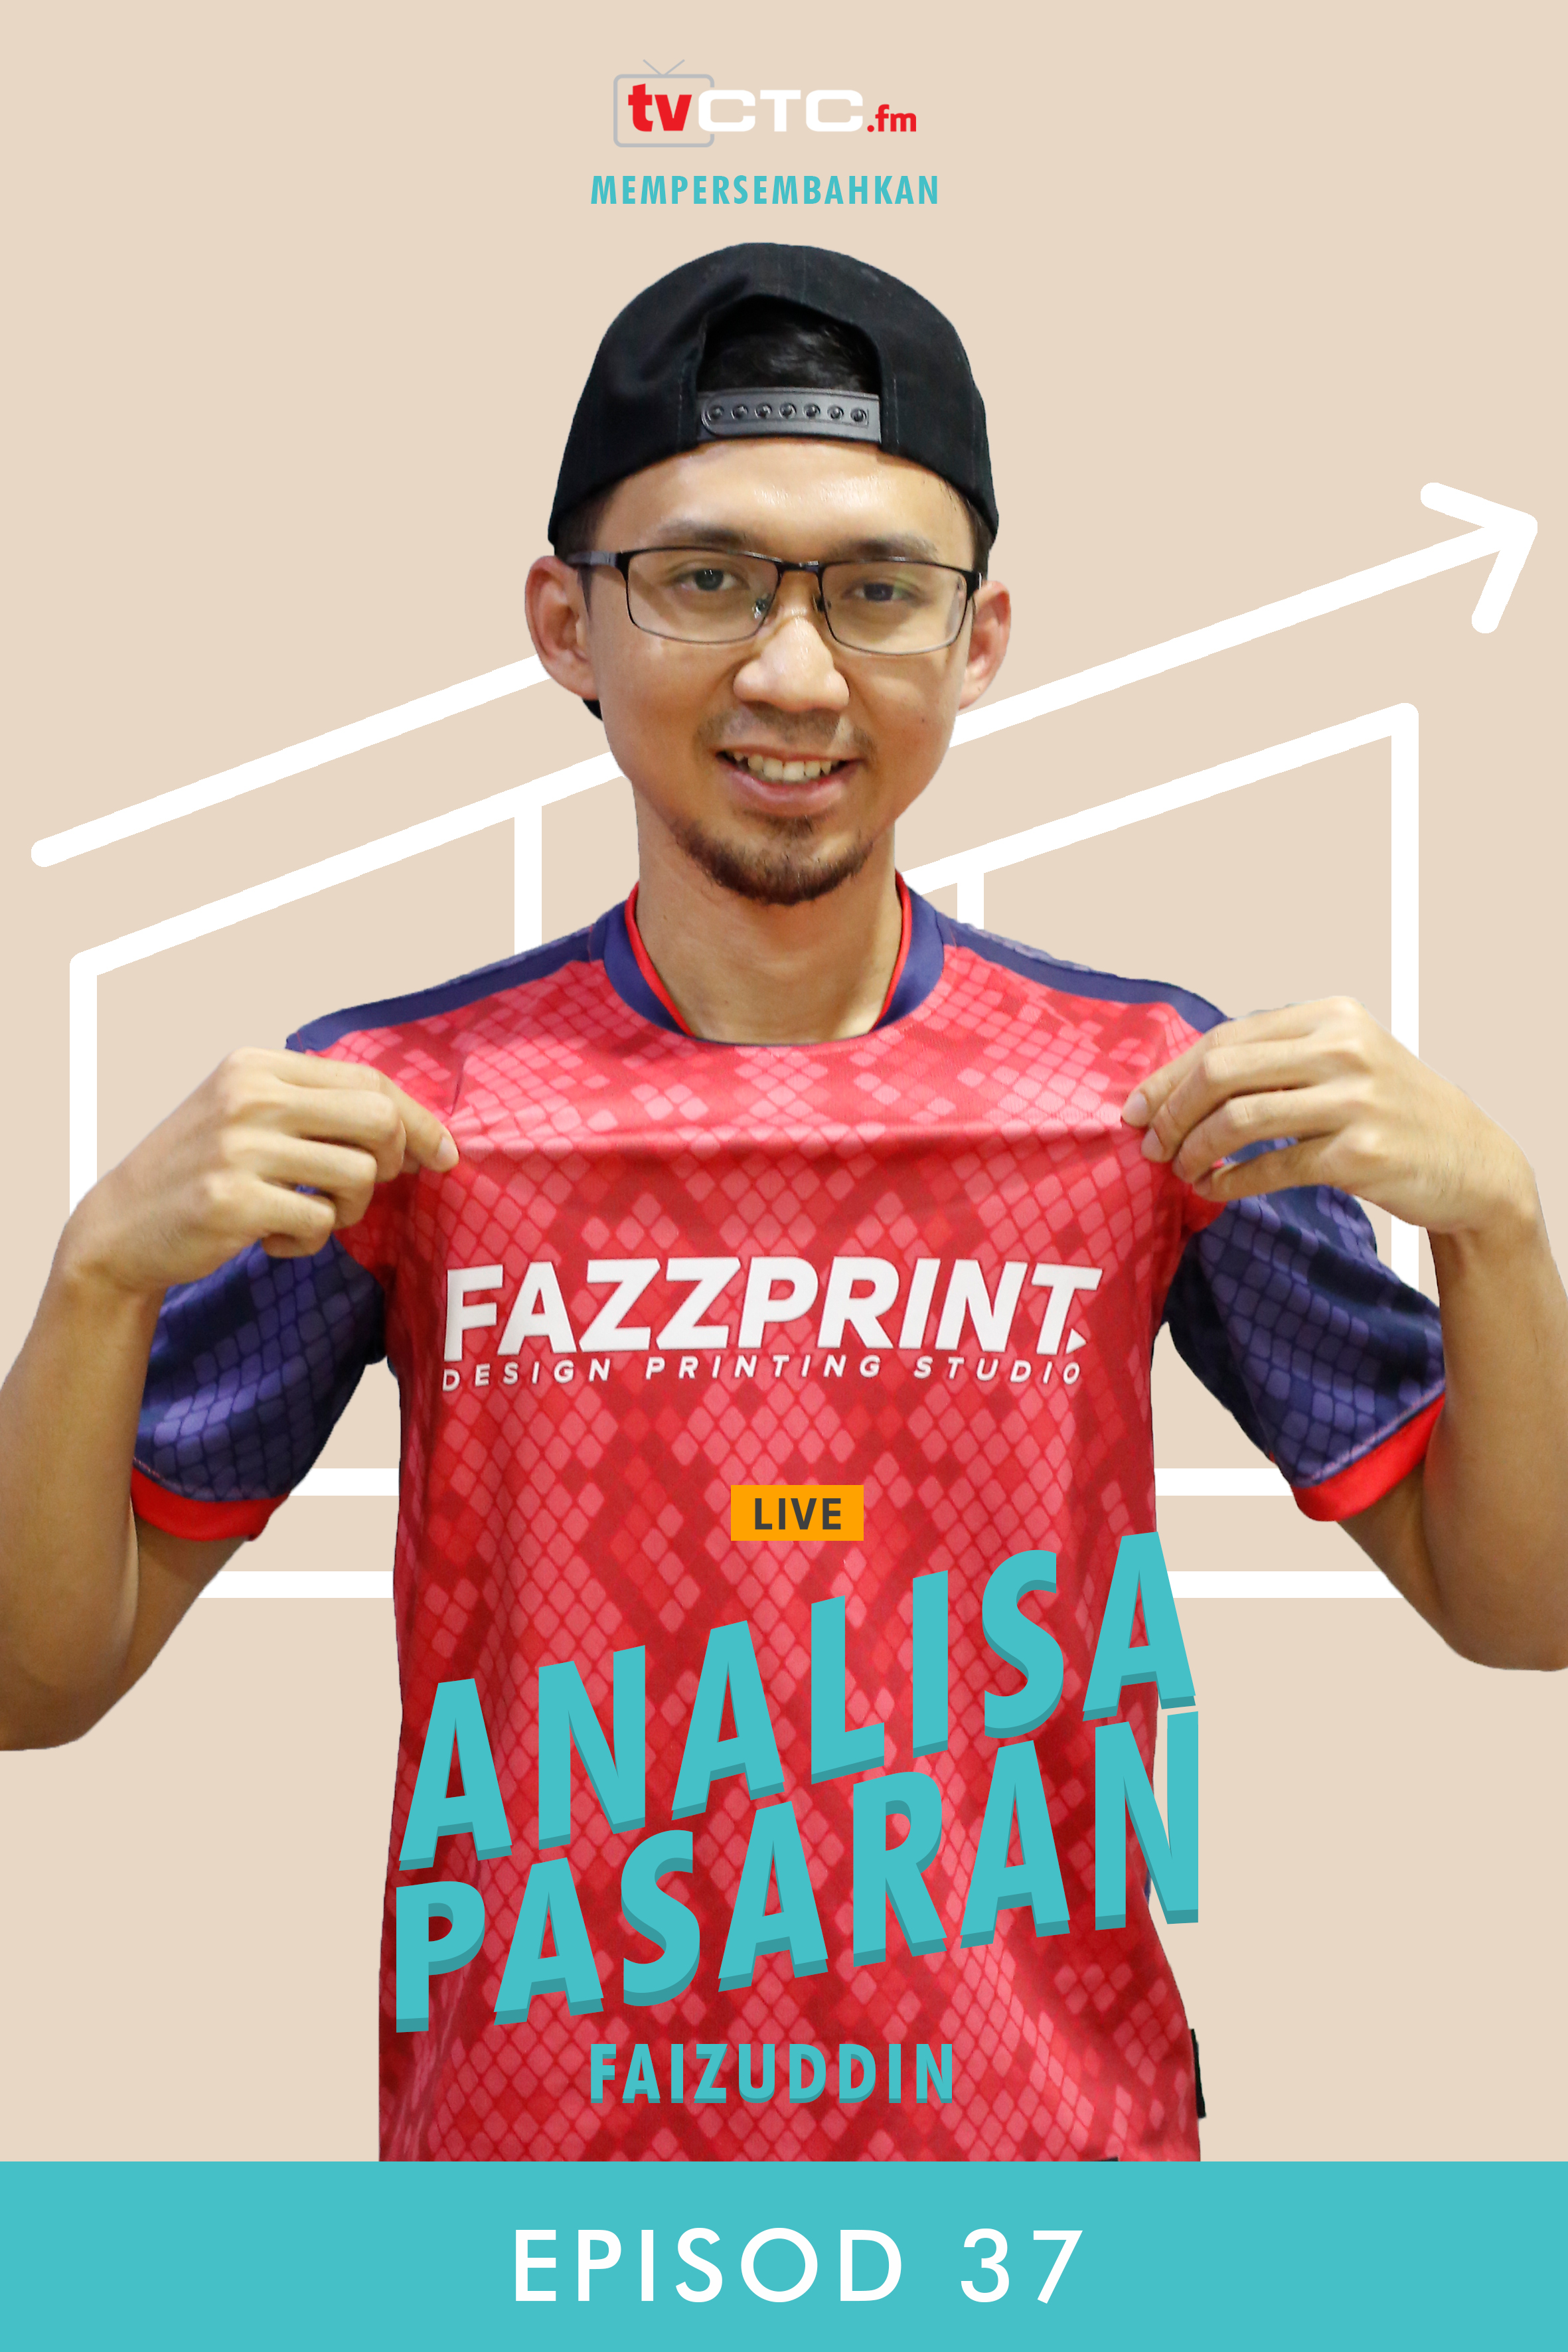 ANALISA PASARAN : Faizuddin (Episod 37)